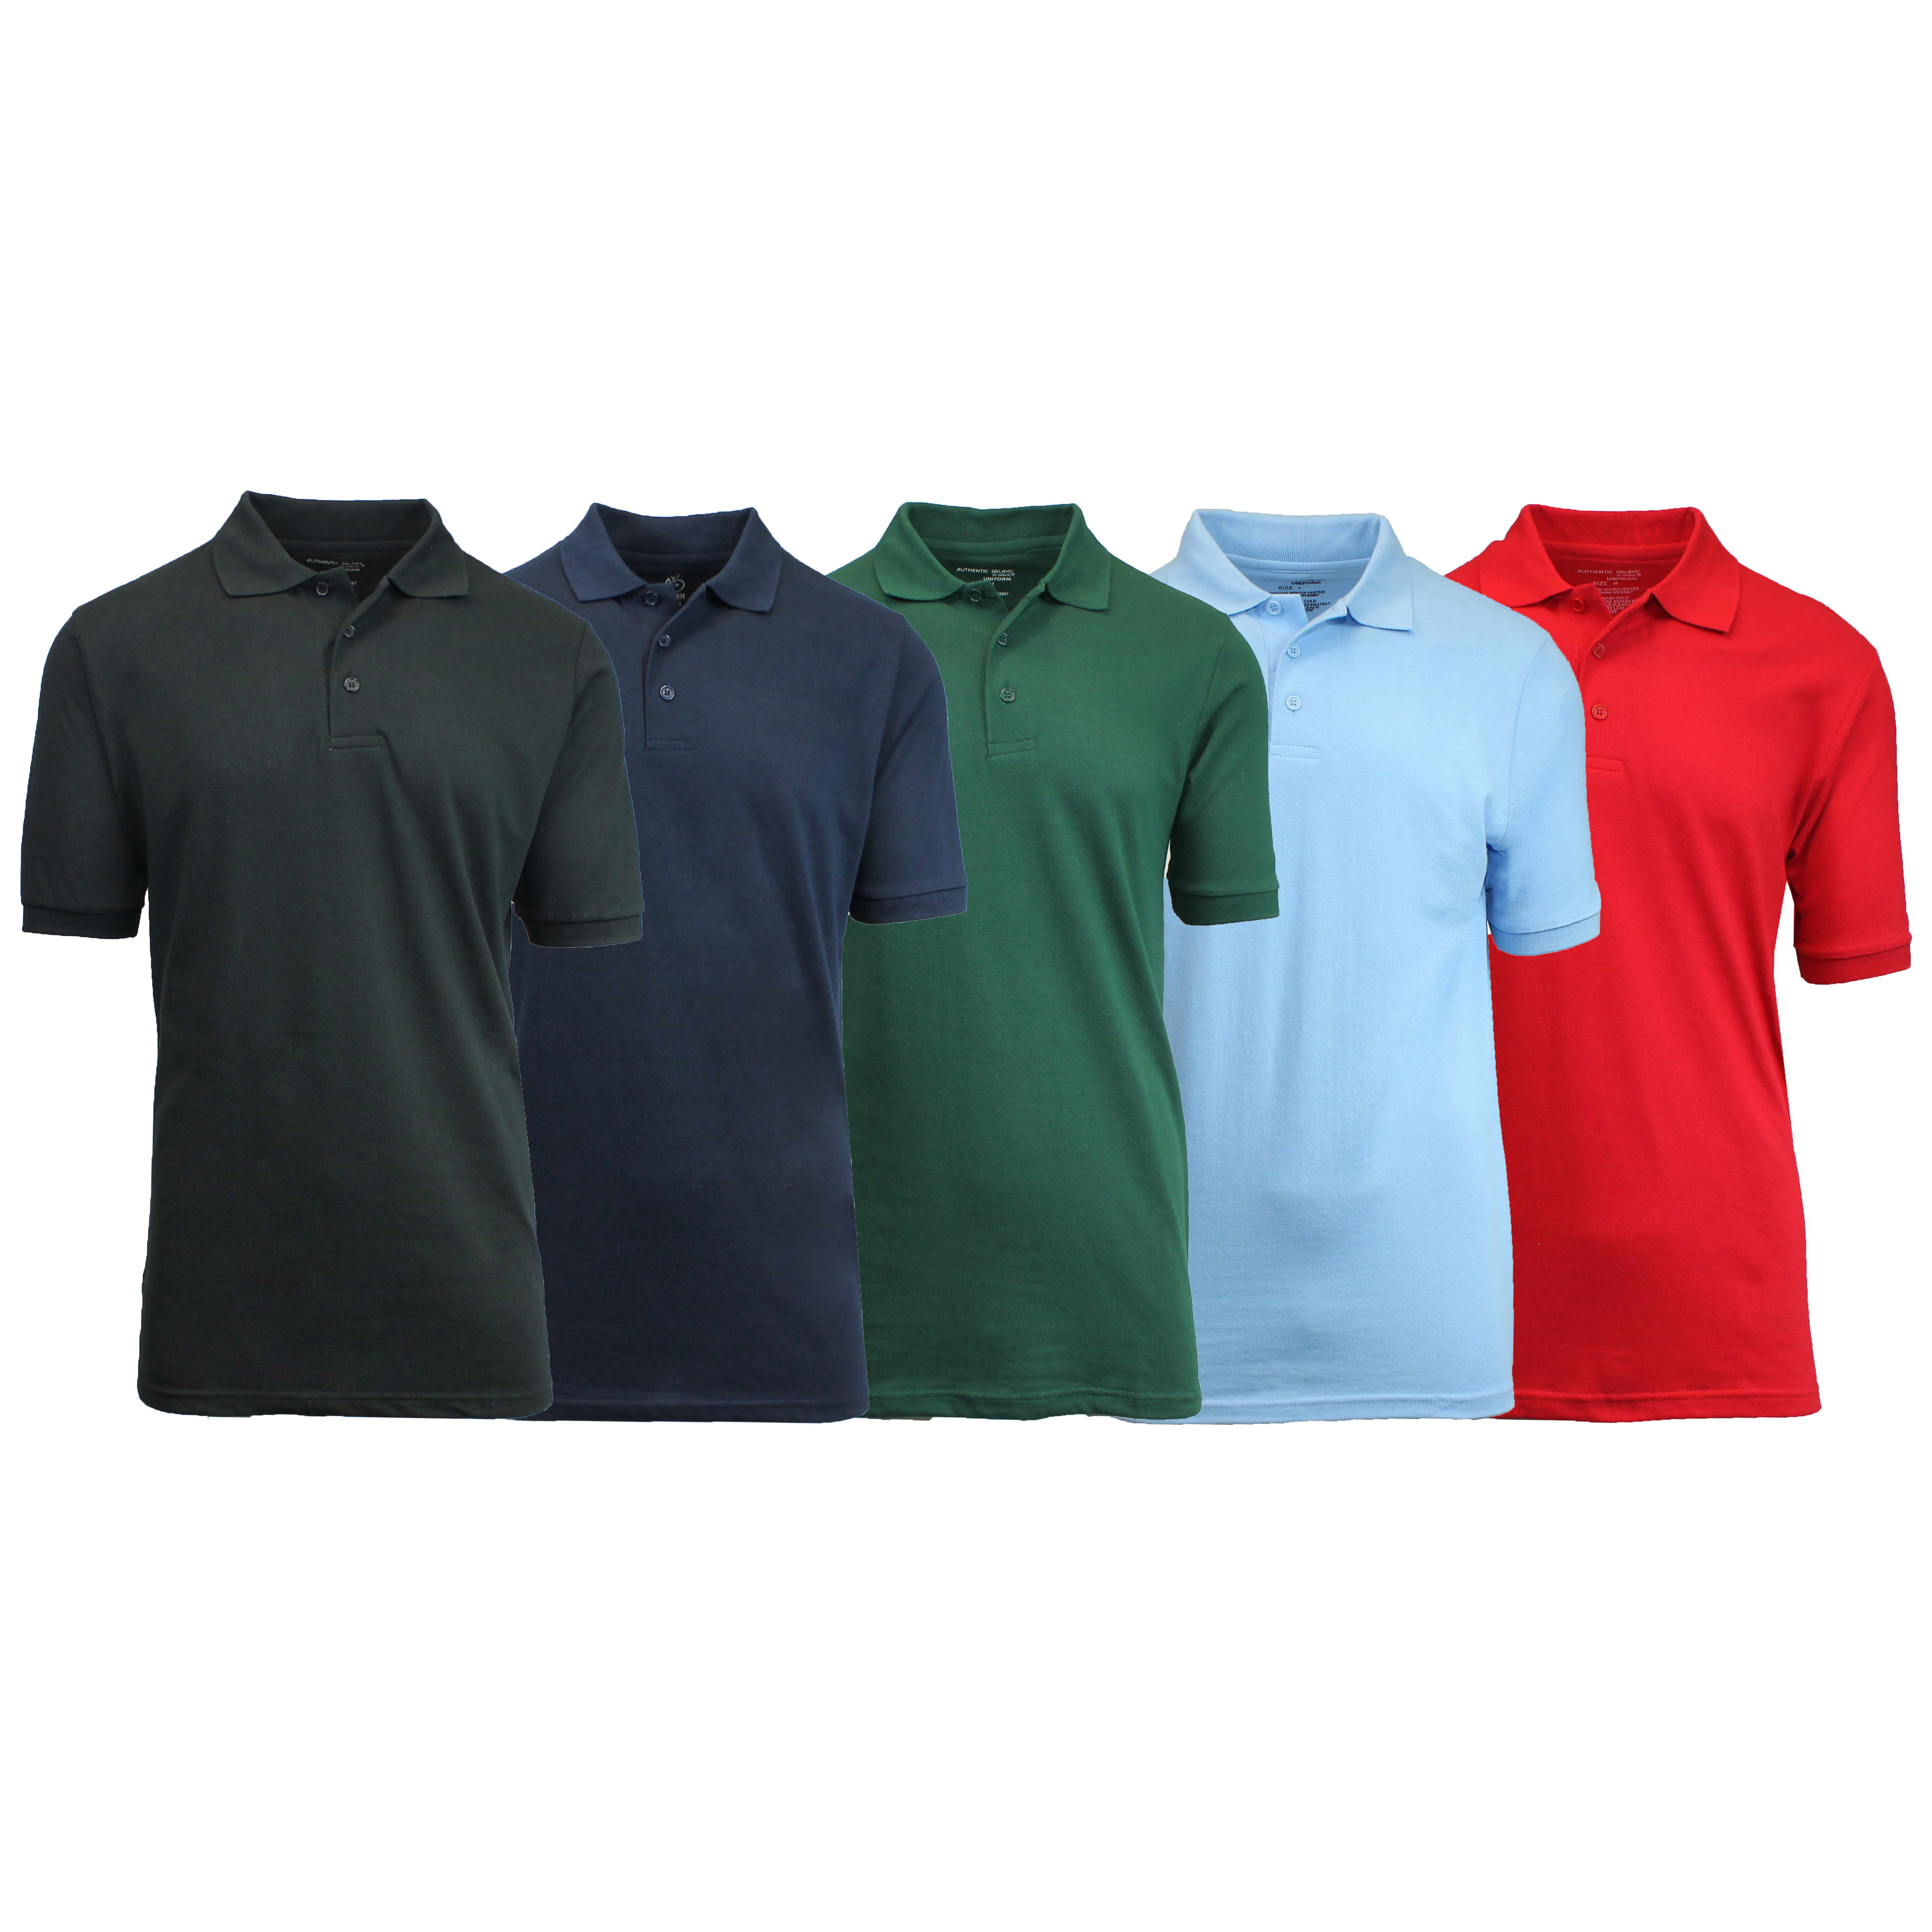 5 Pack Mens Uniform Pique Polo Shirts S 2x Tanga